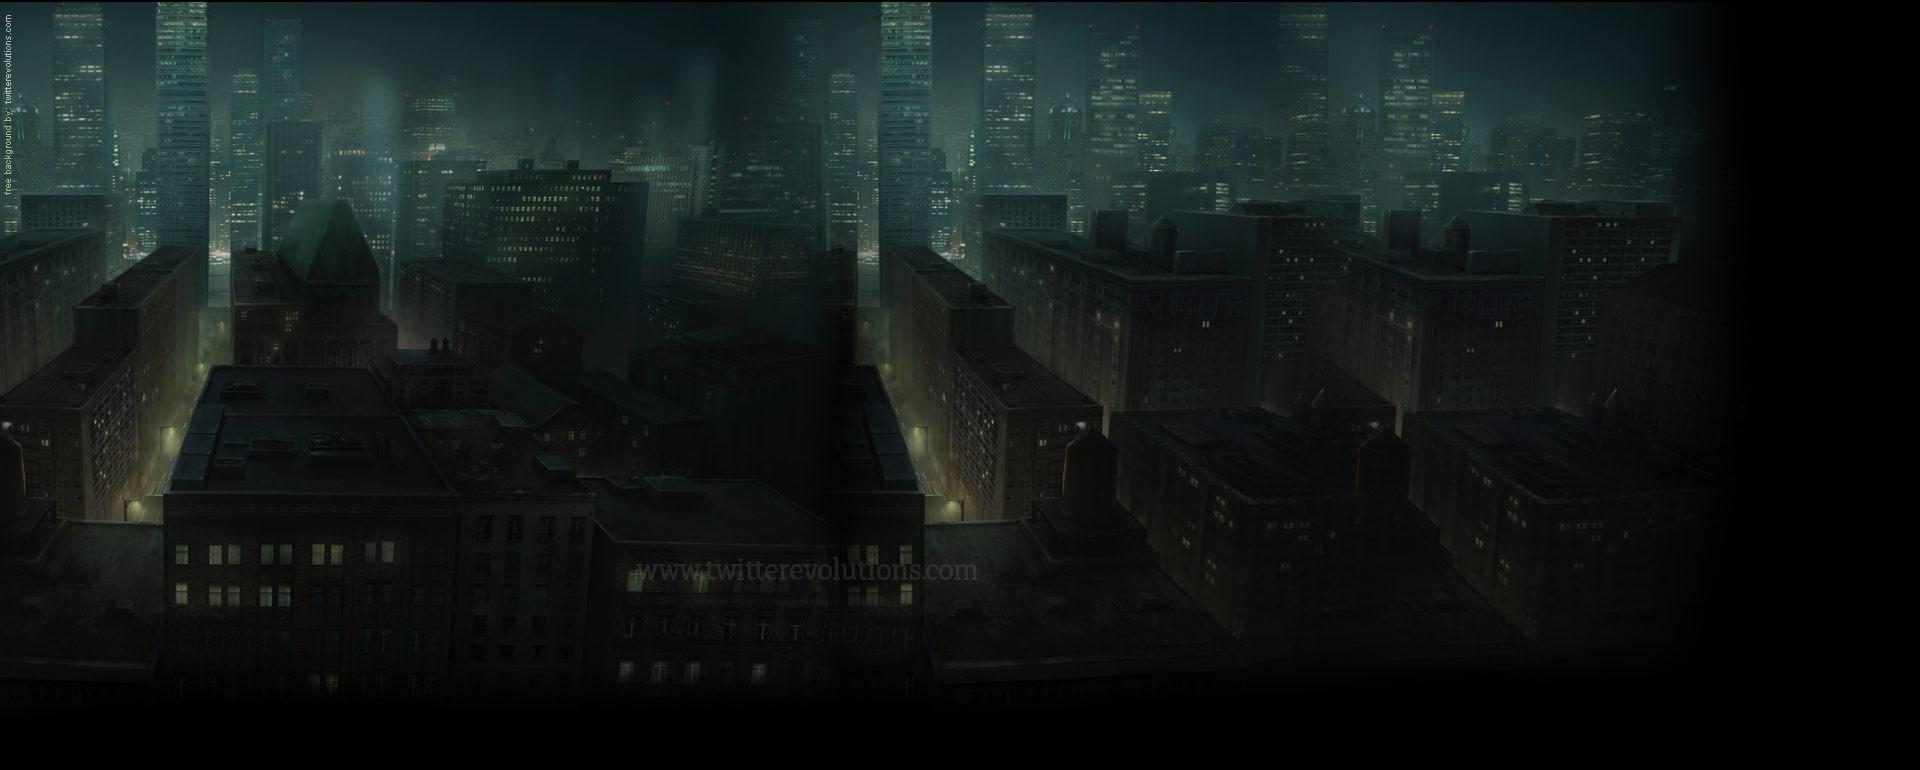 Go Back Pix For Dark City Background 1920x770